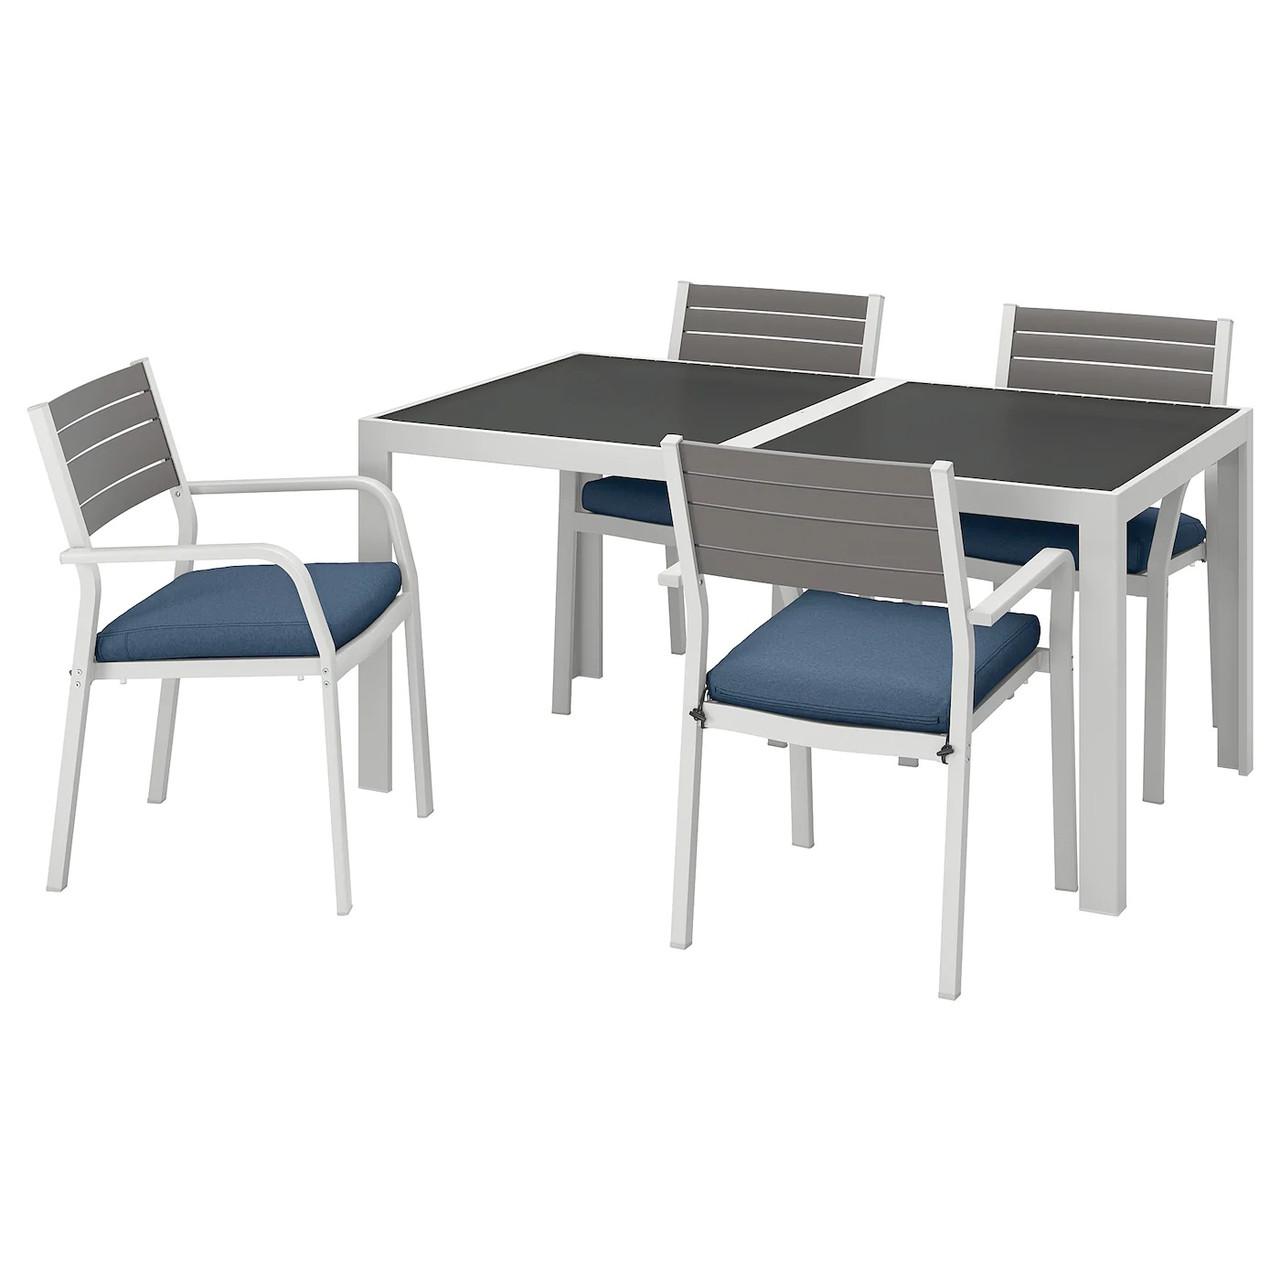 Стол и 4 кресла SJALLAND стекло